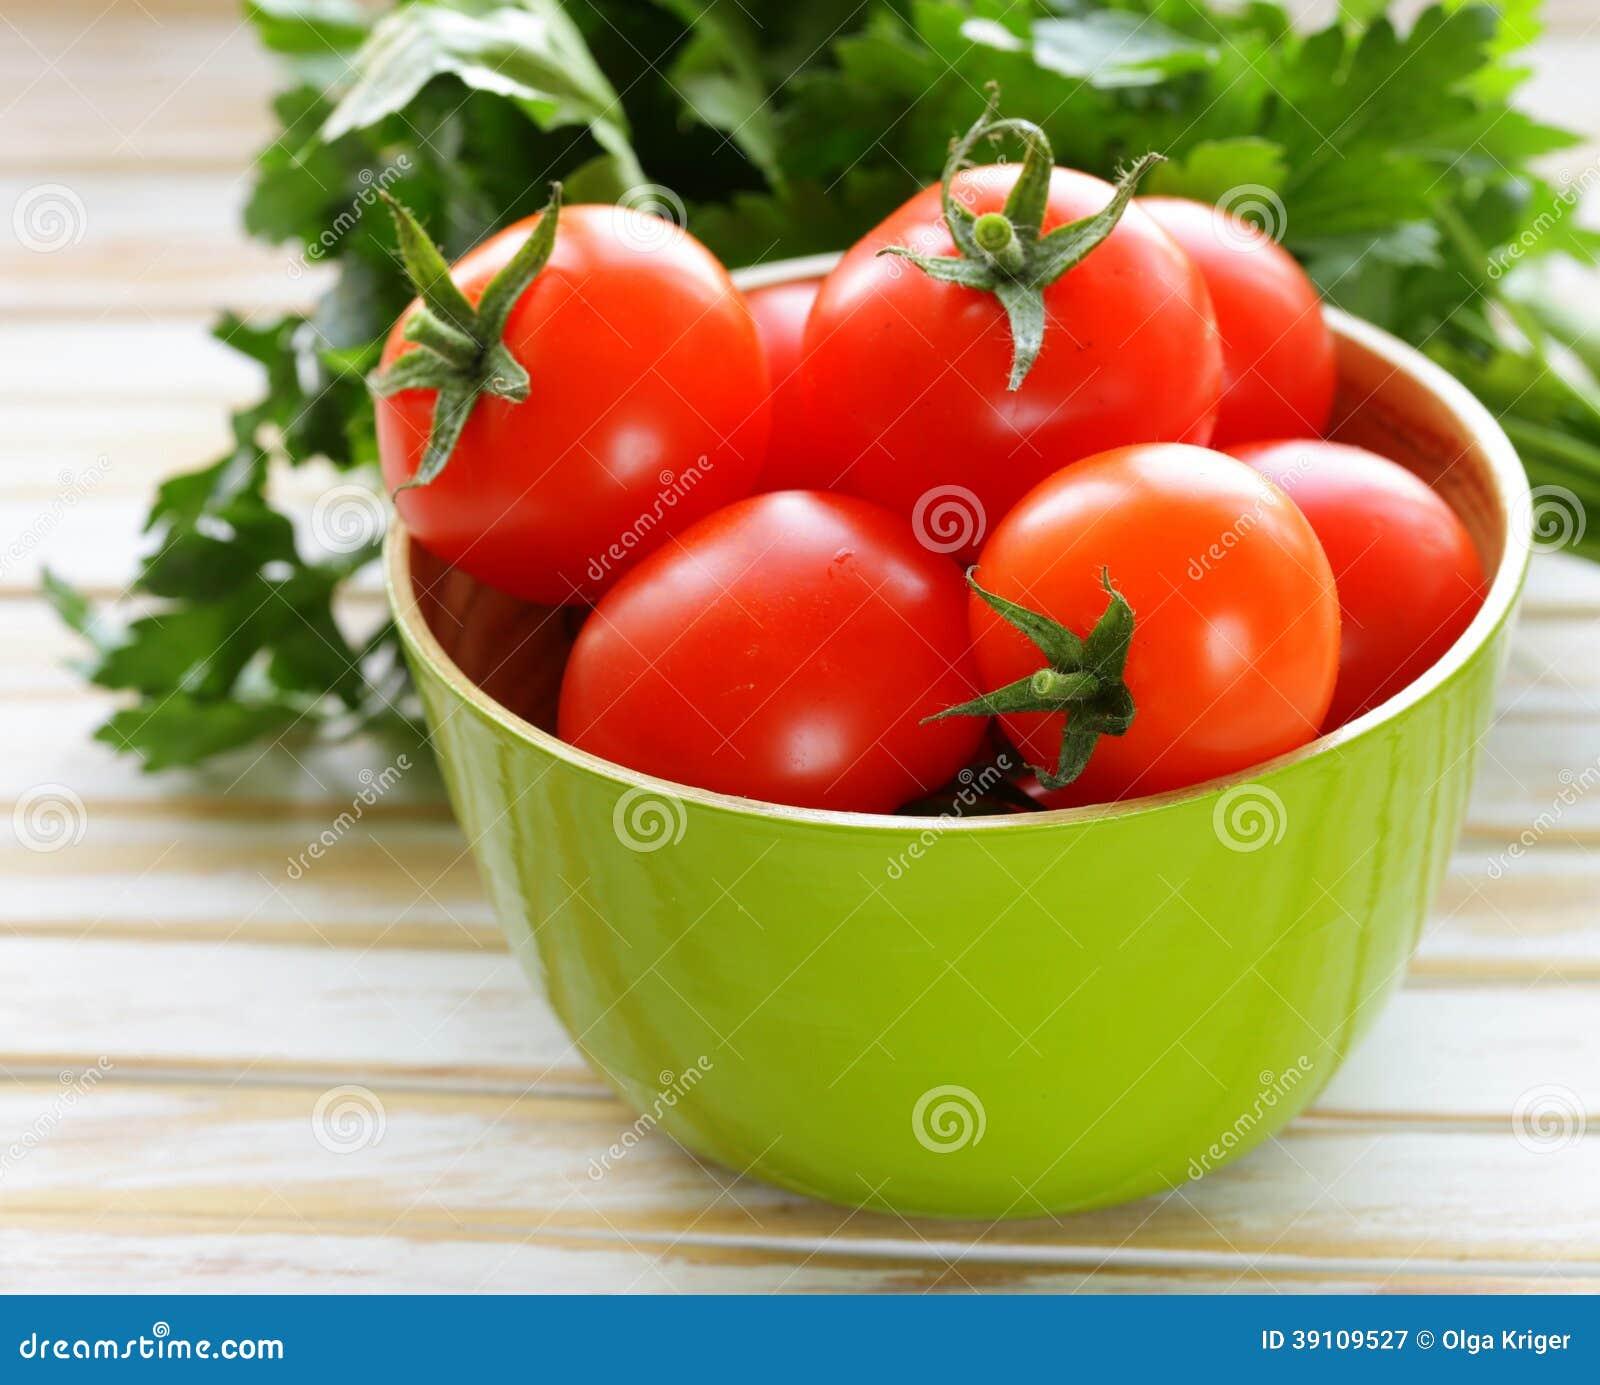 Verse rijpe organische tomaten